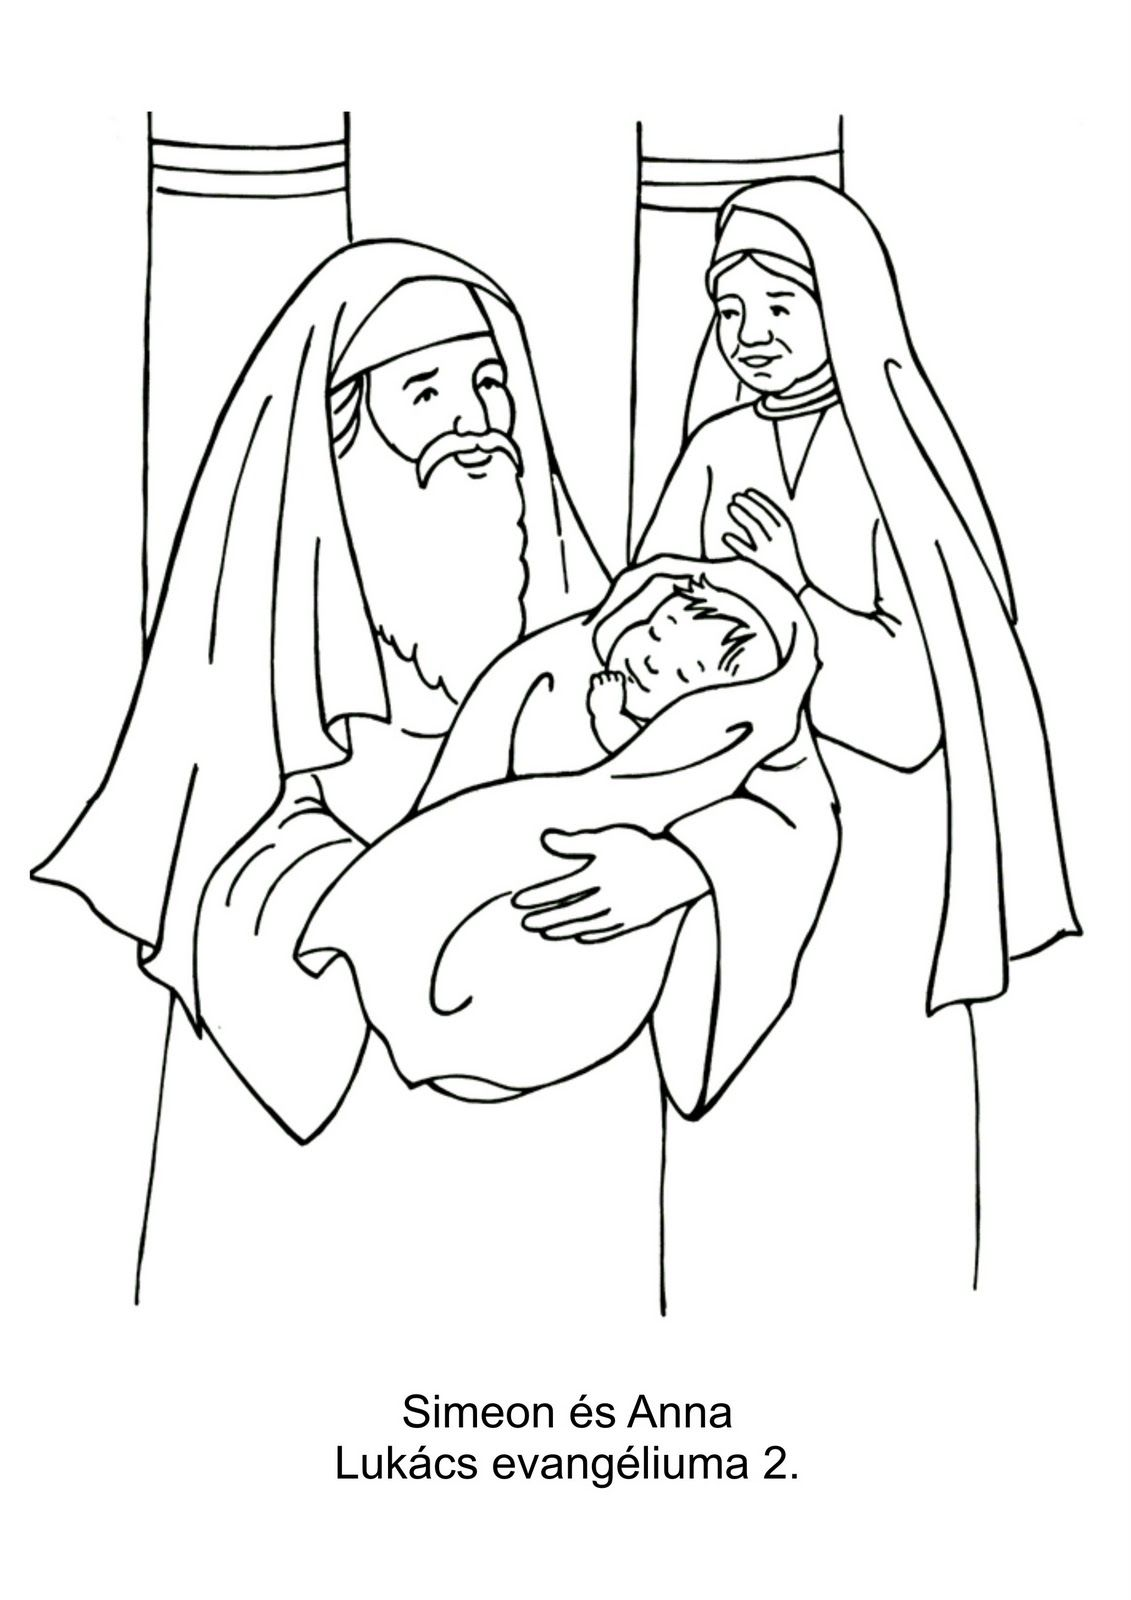 Simeon en Anna | Sunday school | Pinterest | Children church and ...